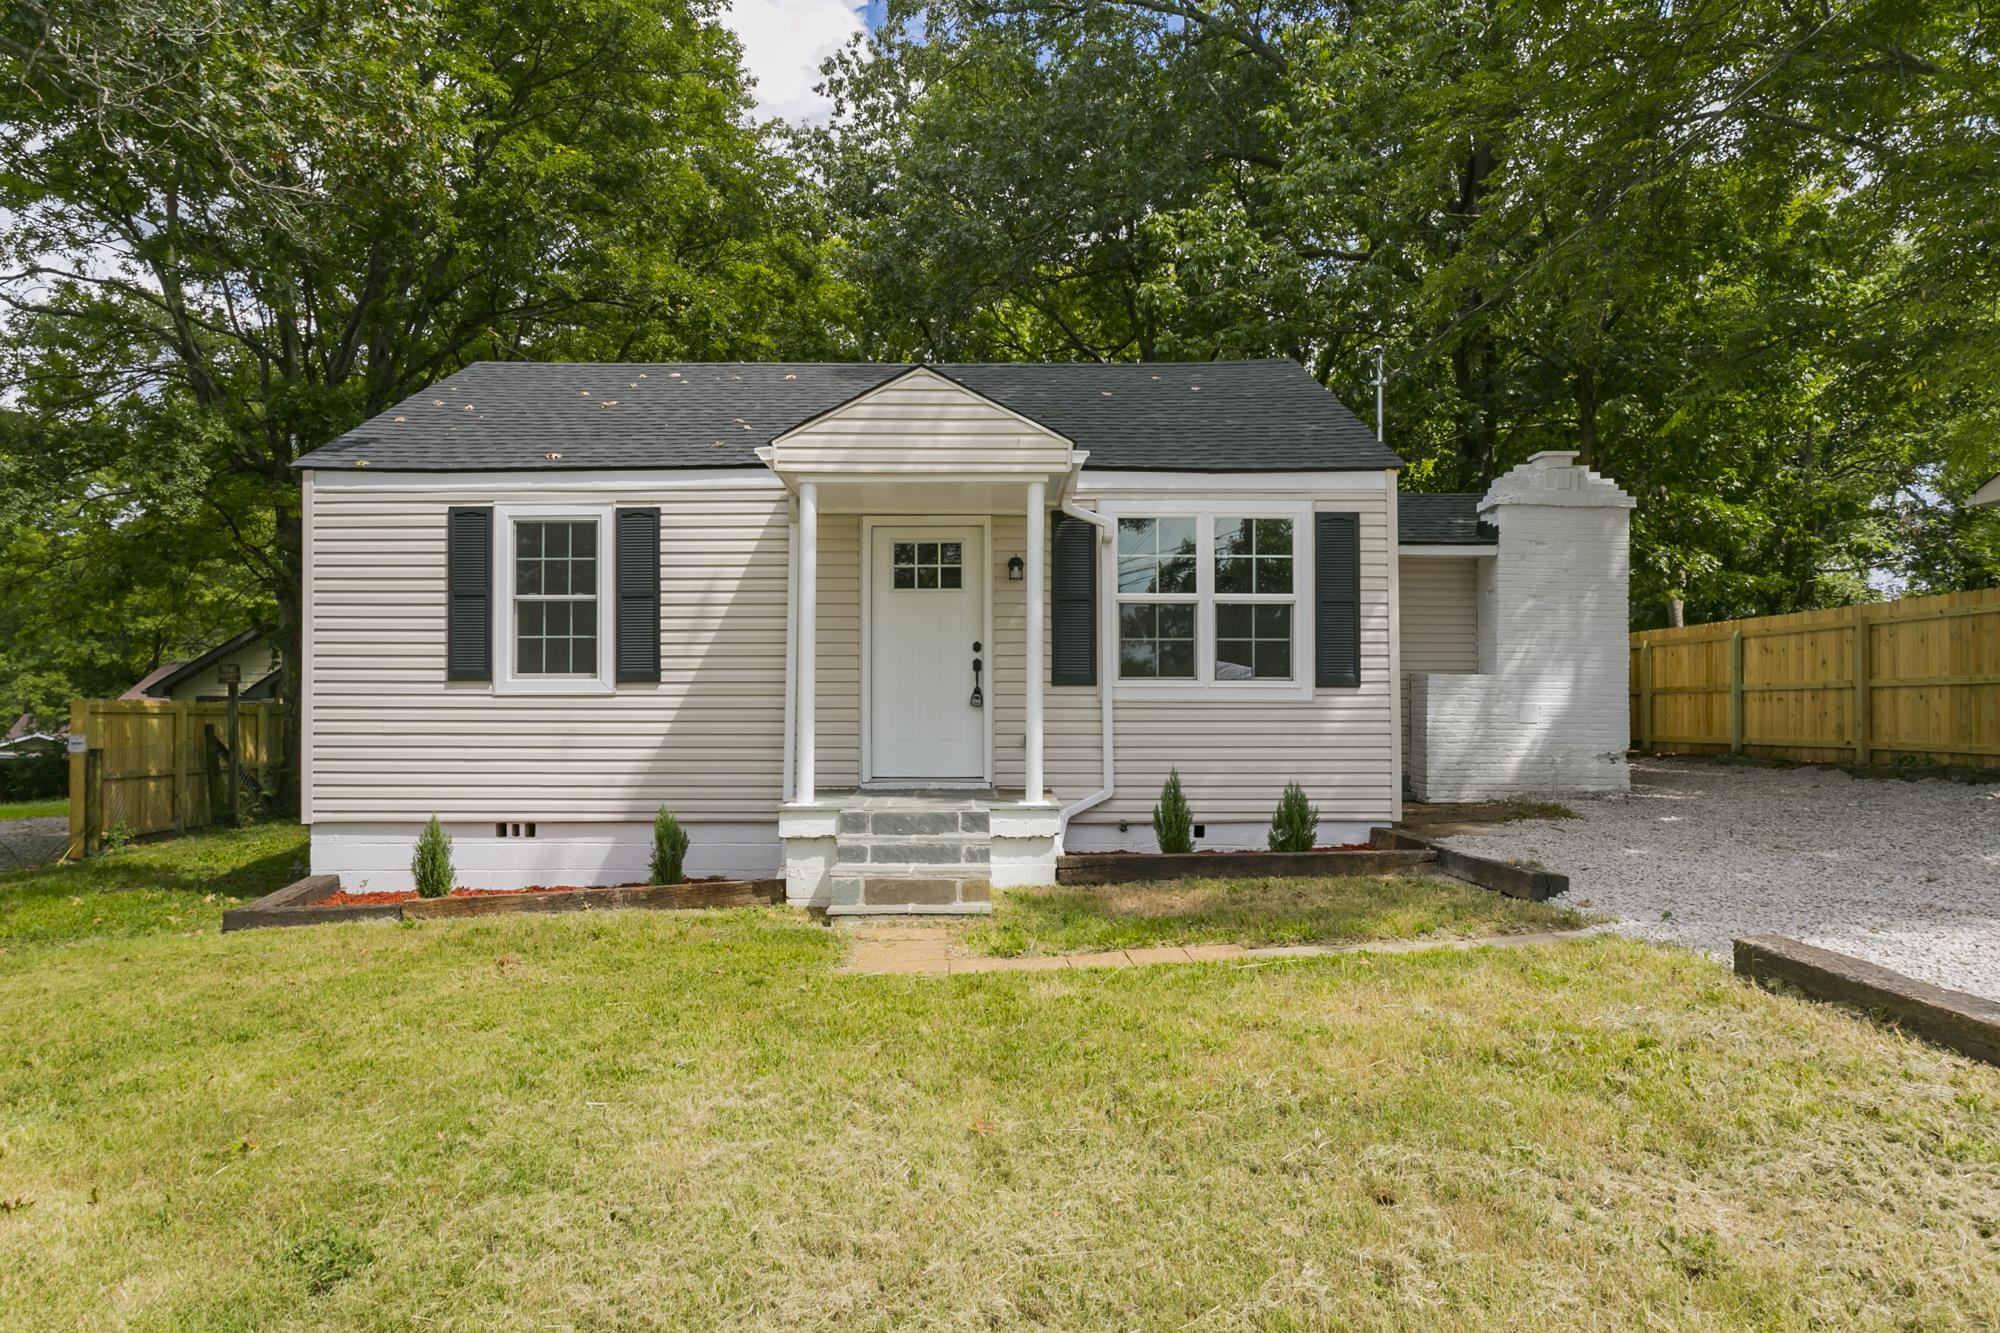 128 Rio Vista Dr, Madison, TN 37115 - Madison, TN real estate listing